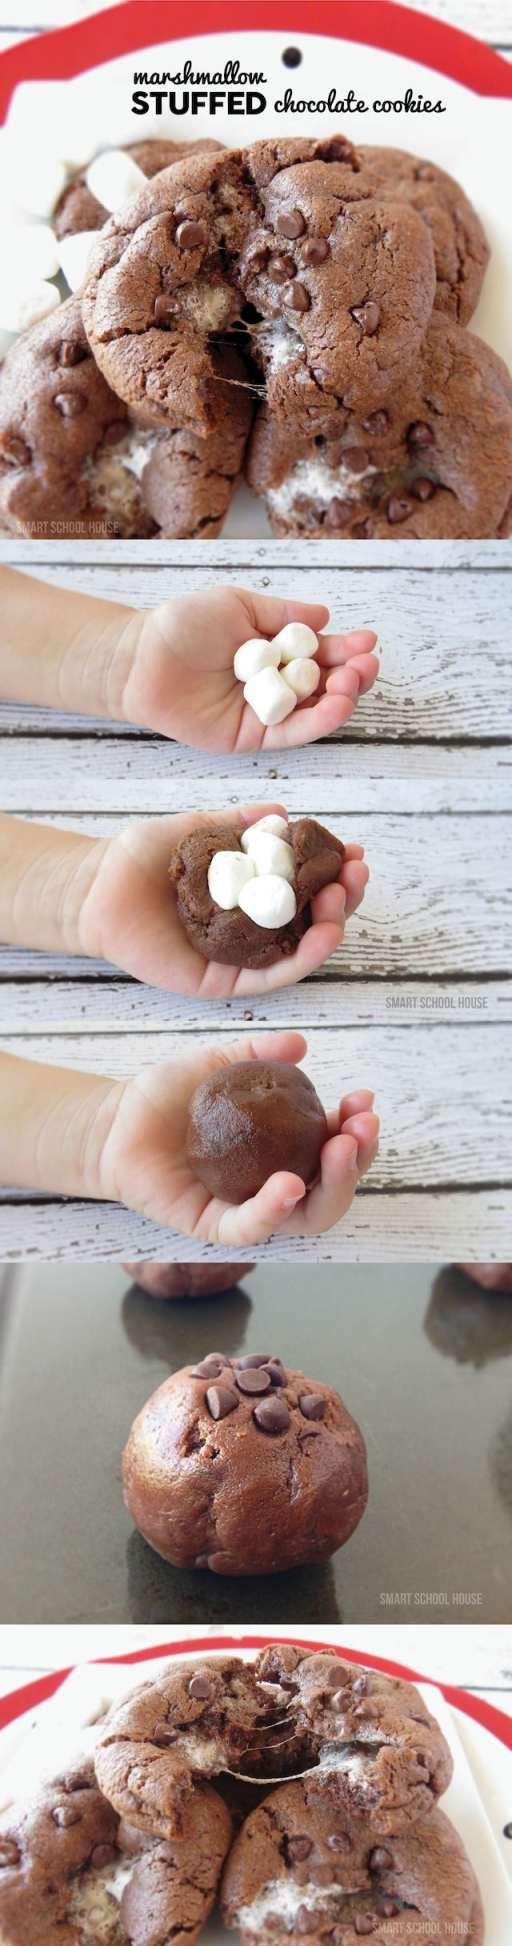 Marshmallow Stuffed Chocolate Chip Cookies